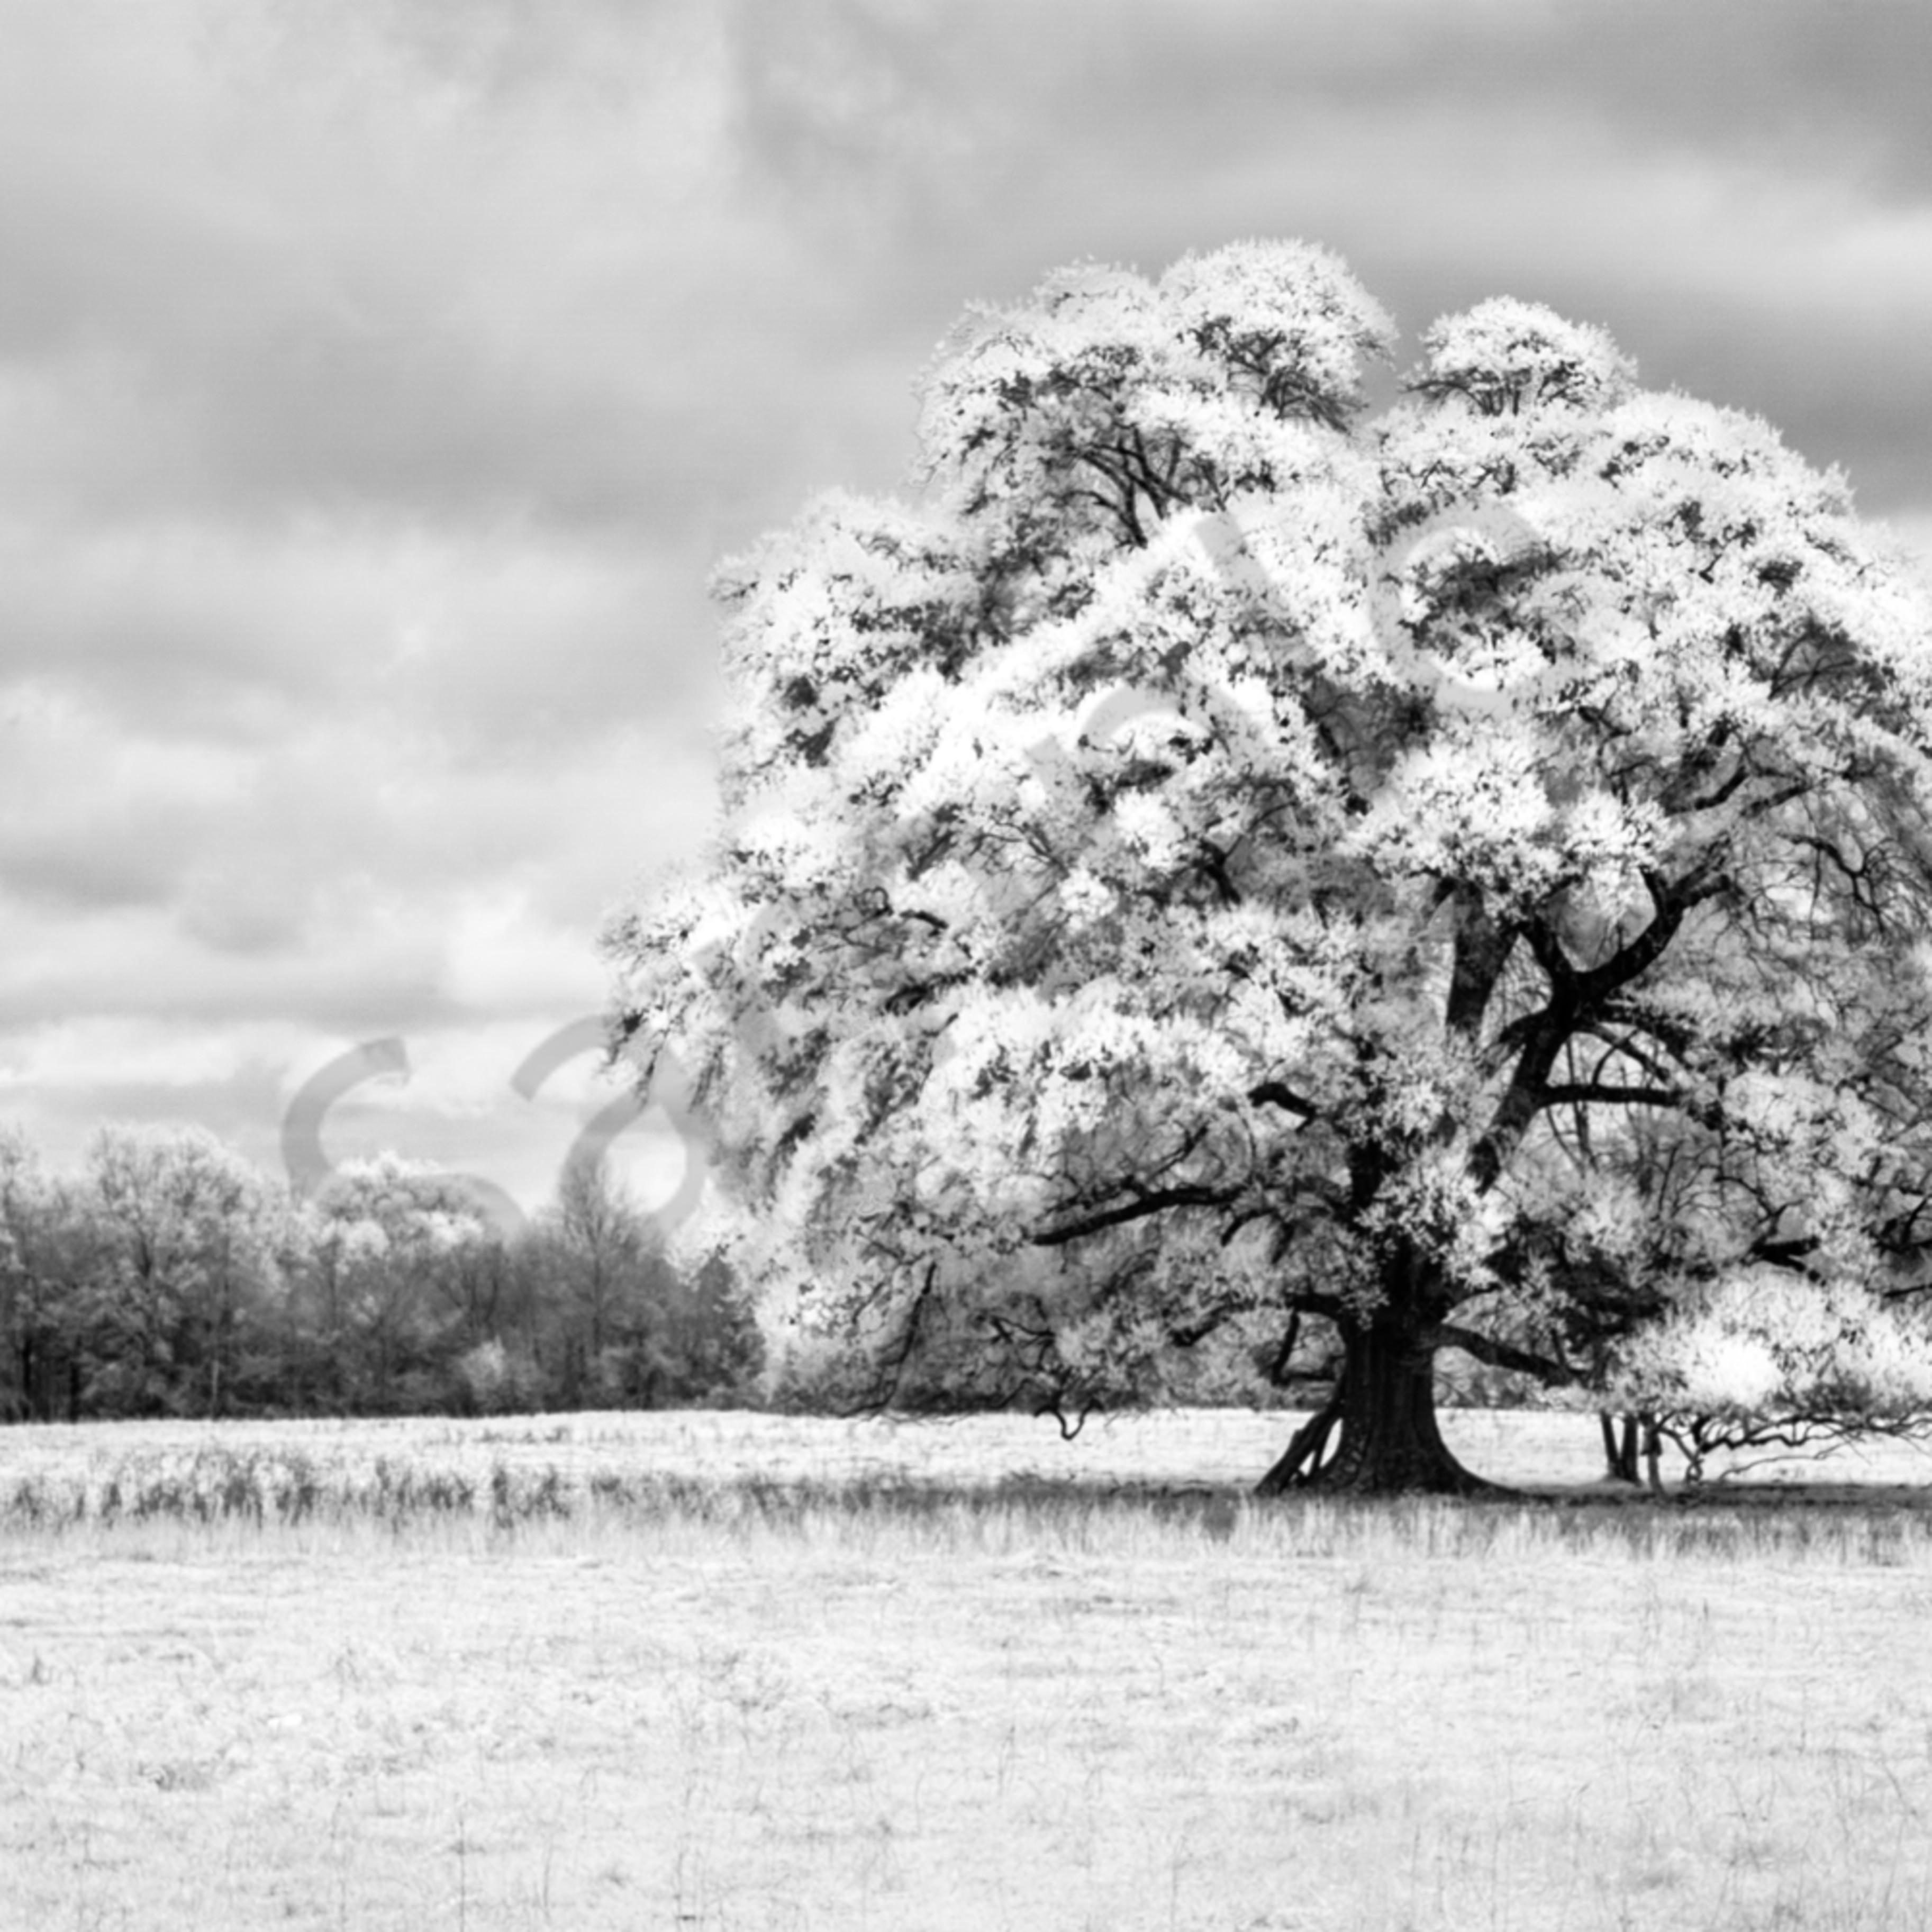 Oaks of righteousness by harold vincent qtkqsr